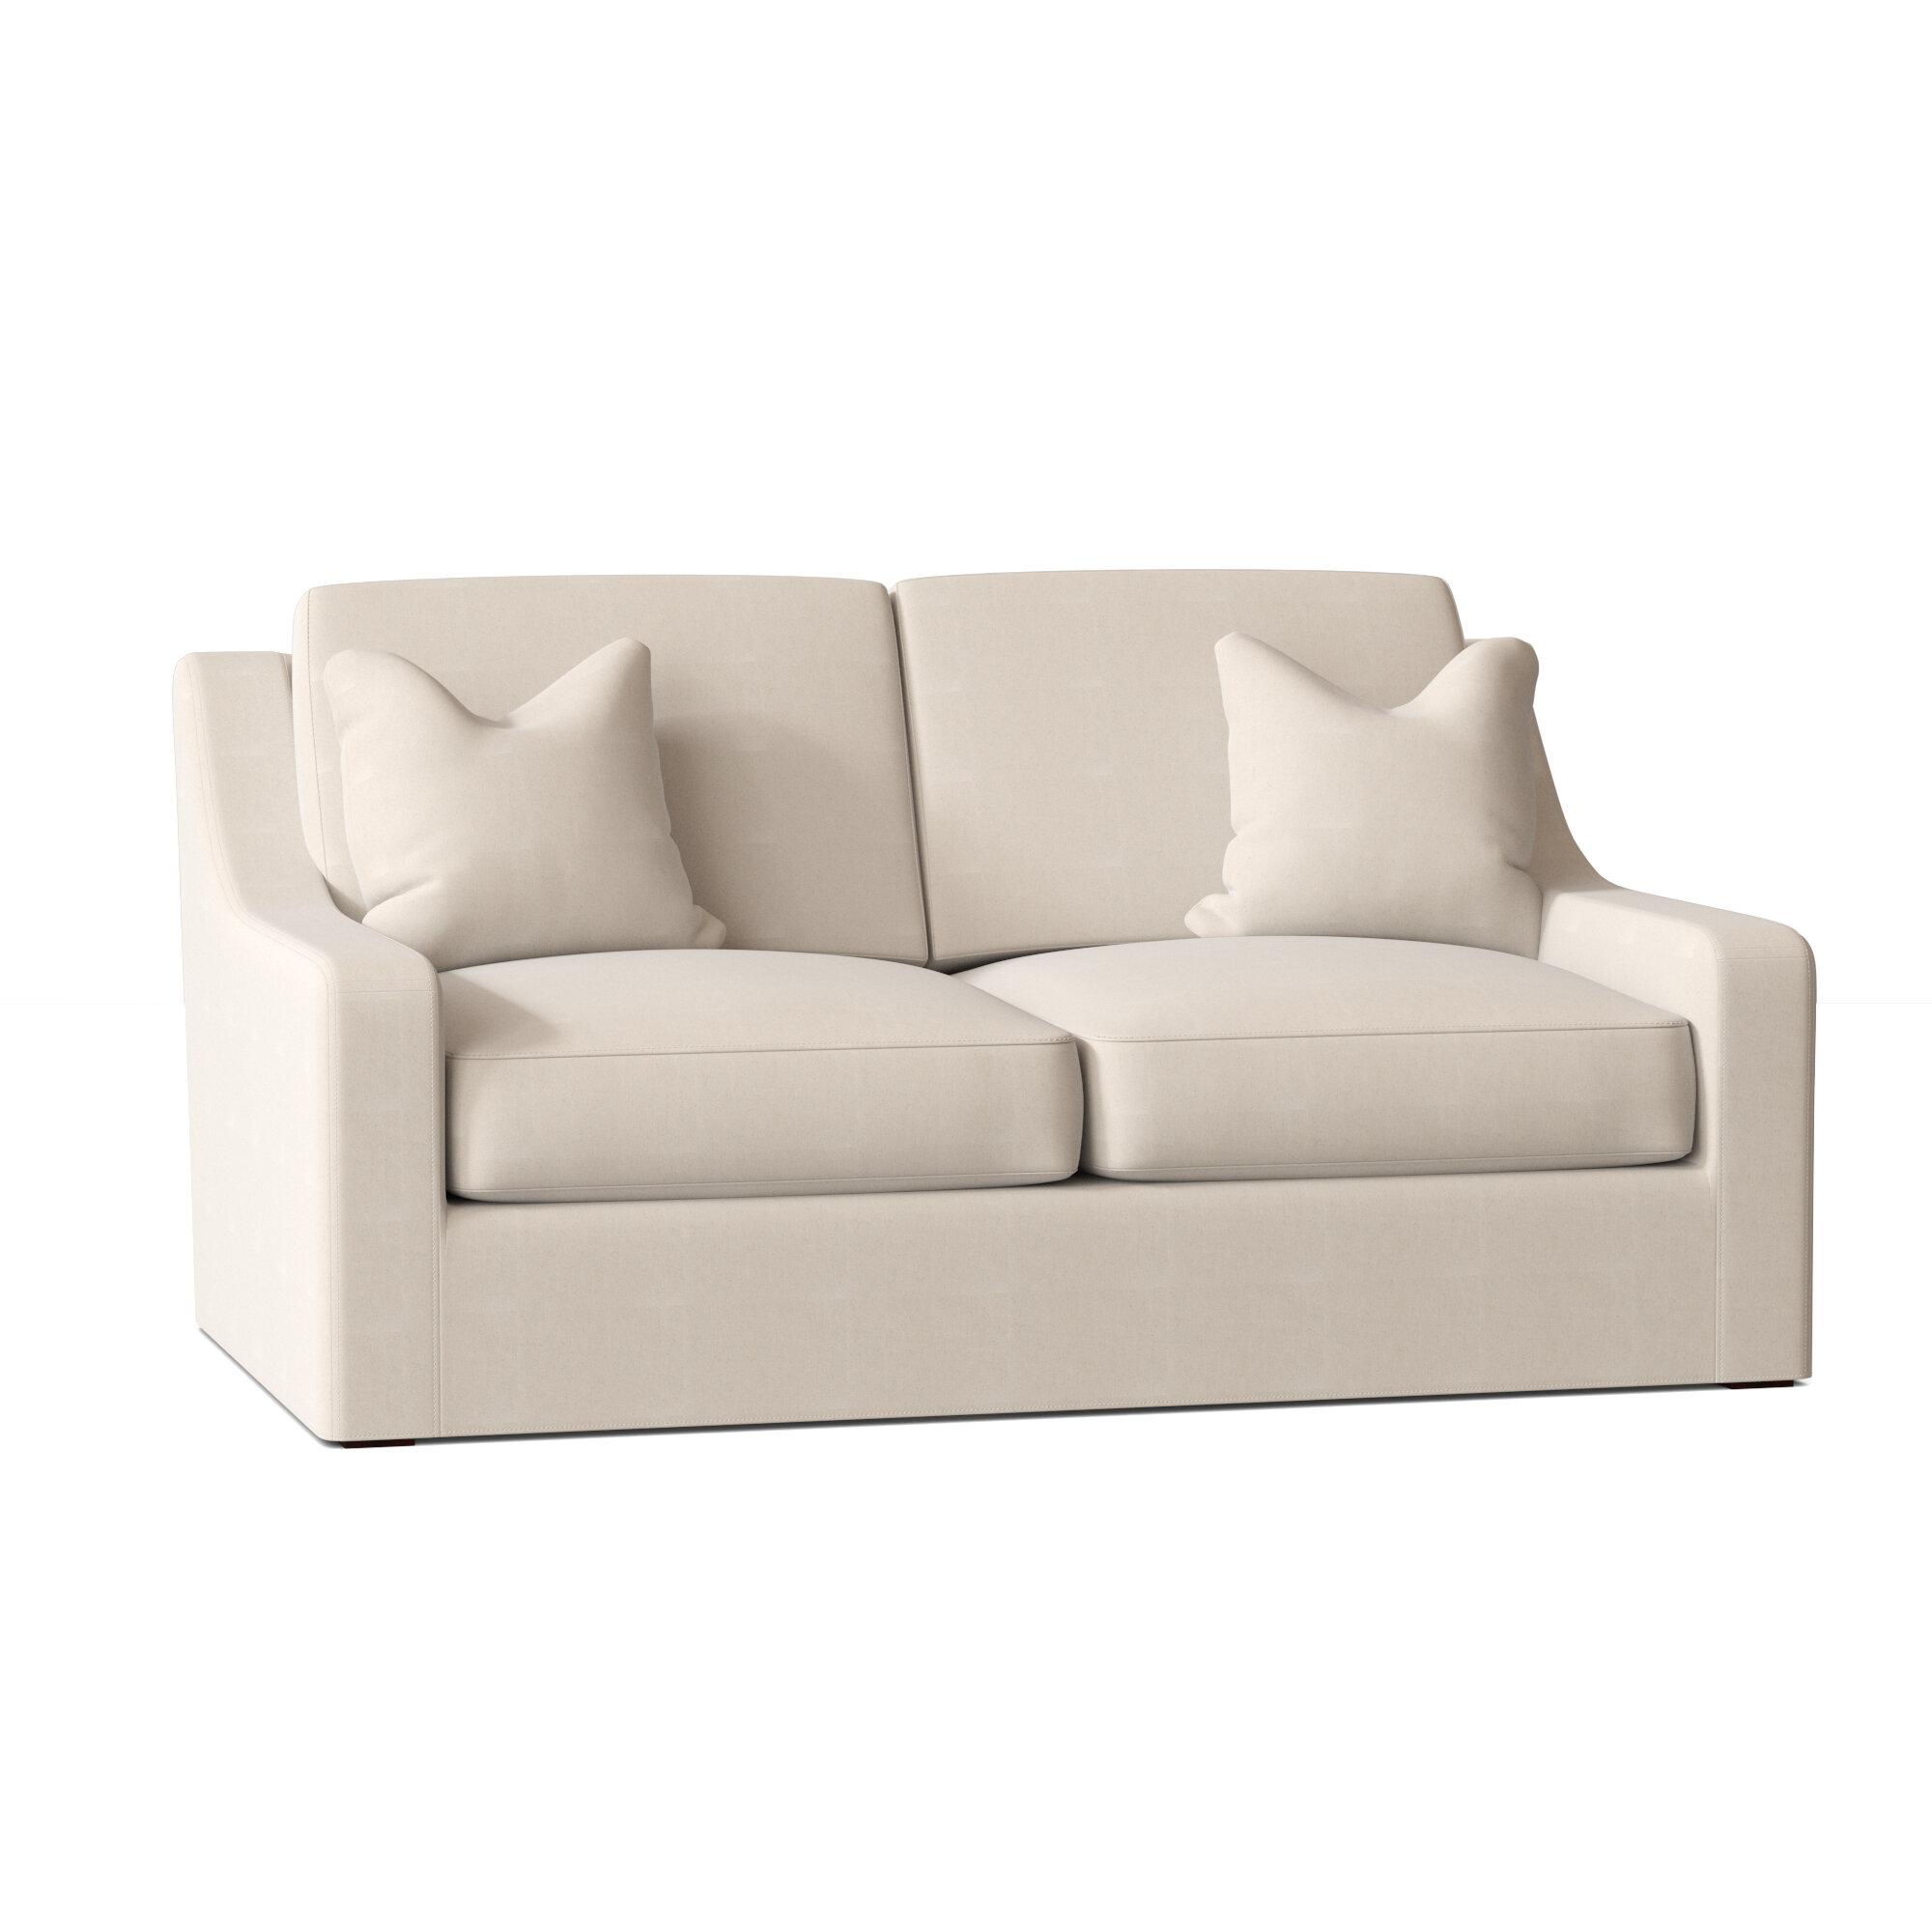 Wayfair Custom Upholstery Maggie 68 Square Arm Loveseat Reviews Wayfair